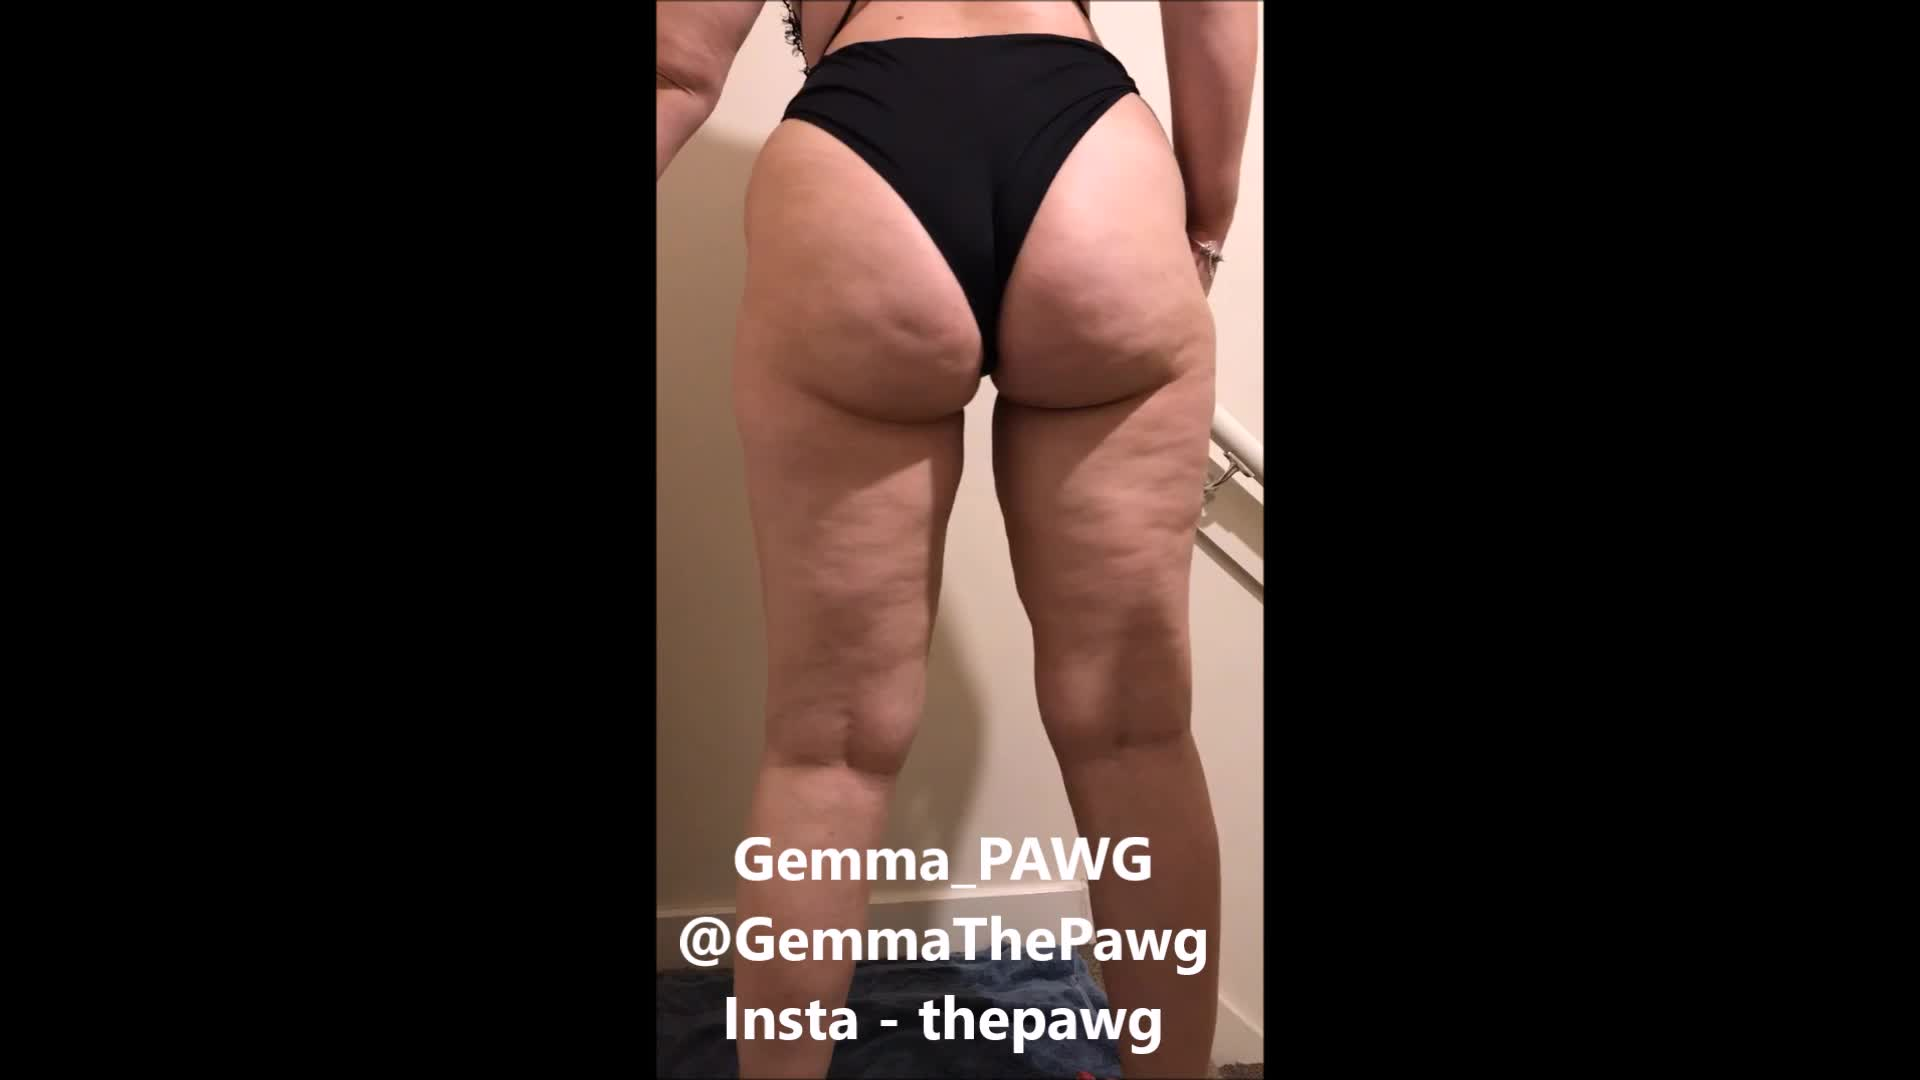 Gemma_PAWG'd vid